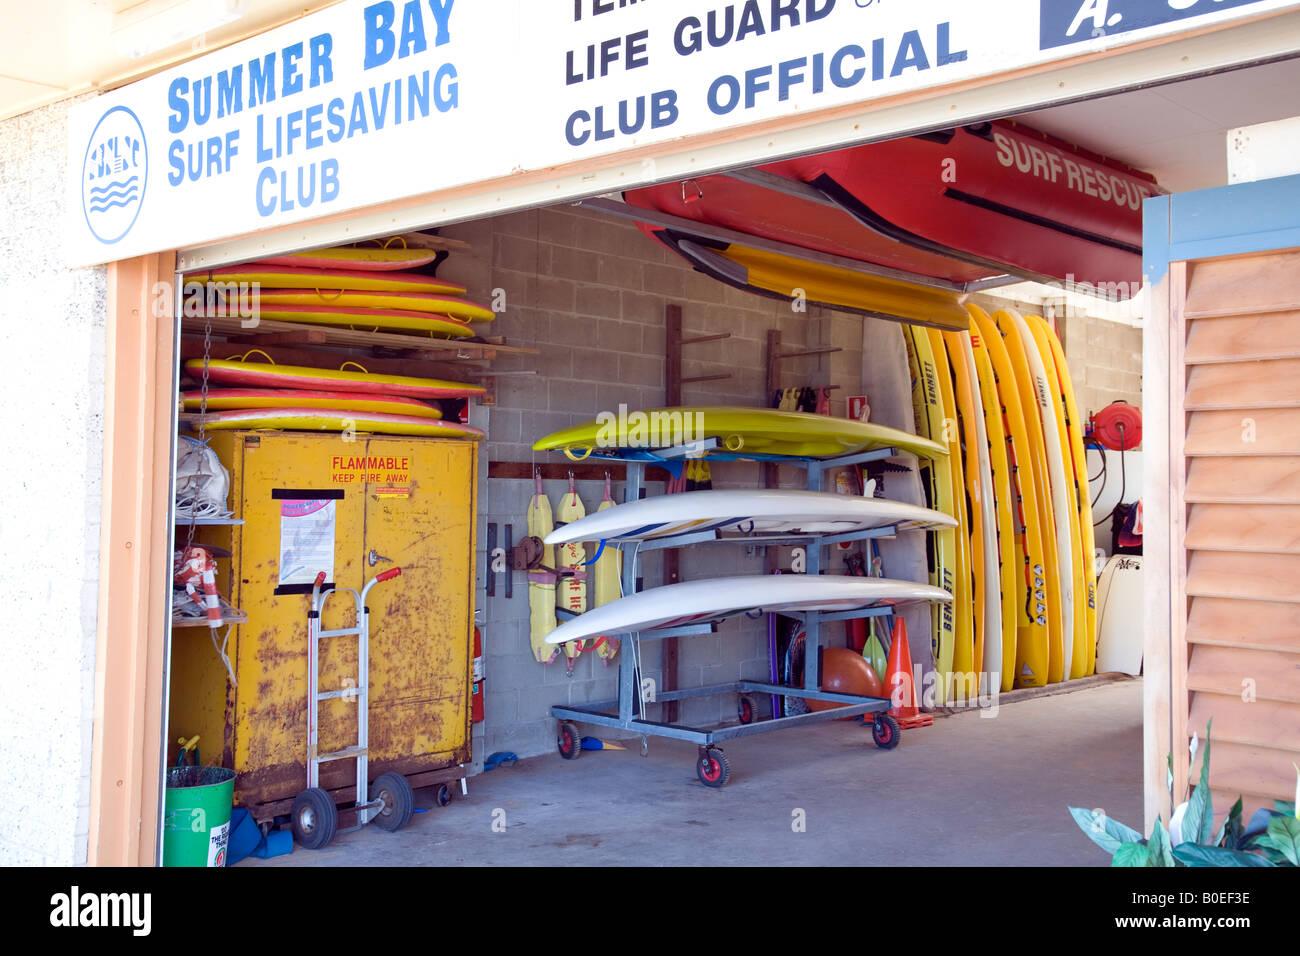 Club home sydney australia pictures.